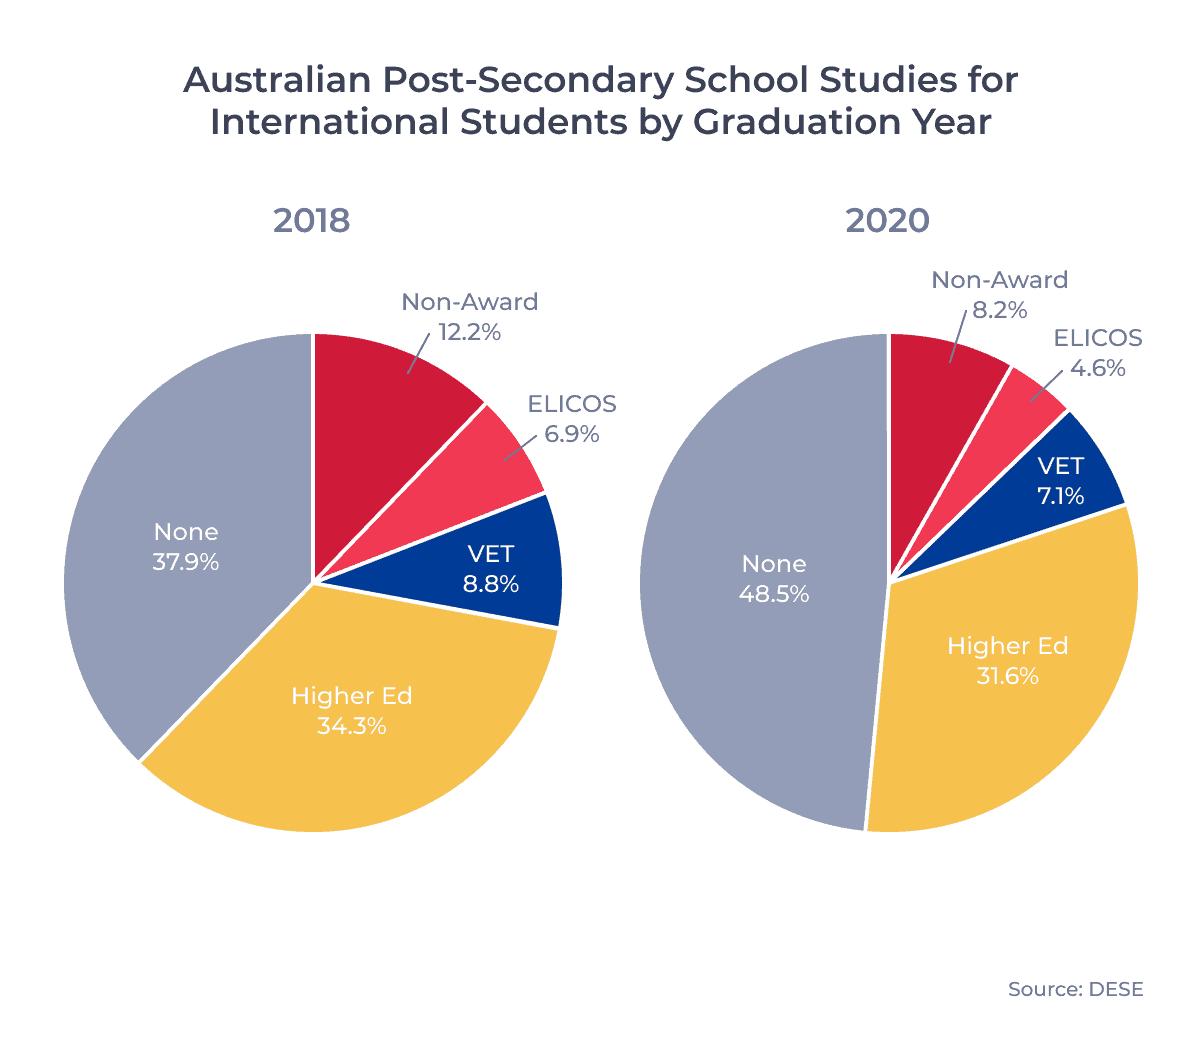 Australian Post-Secondary School Studies for International Students by Graduation Year